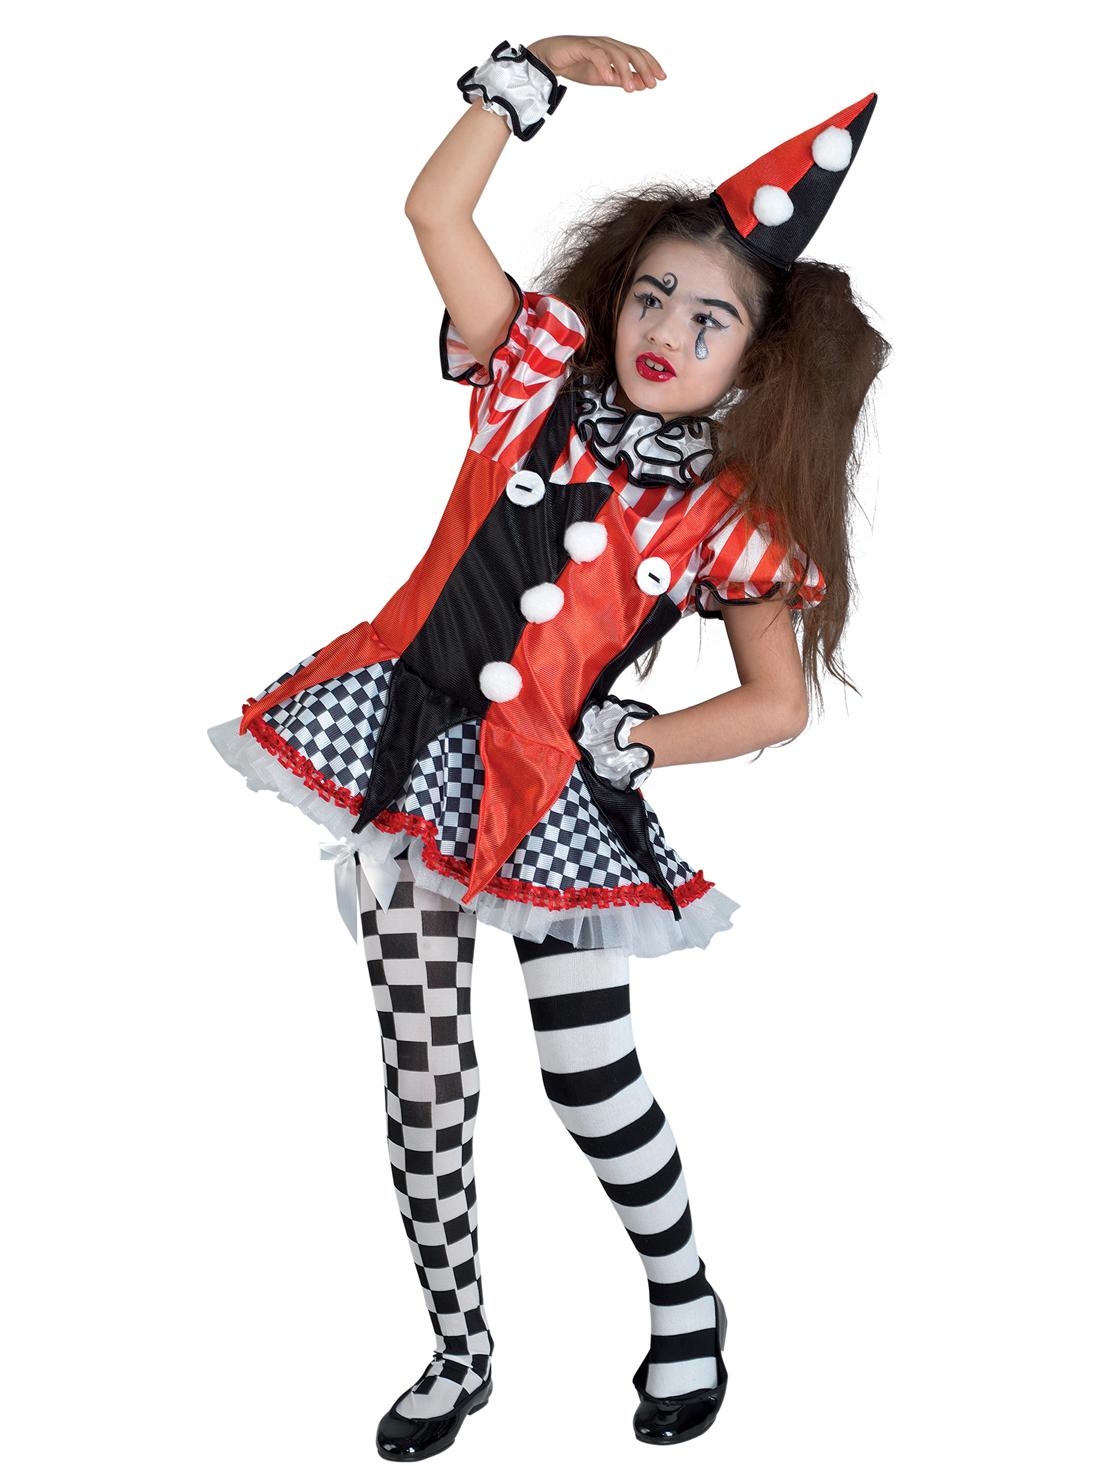 harlekin kinderkost m clown schwarz weiss rot g nstige faschings kost me bei karneval megastore. Black Bedroom Furniture Sets. Home Design Ideas